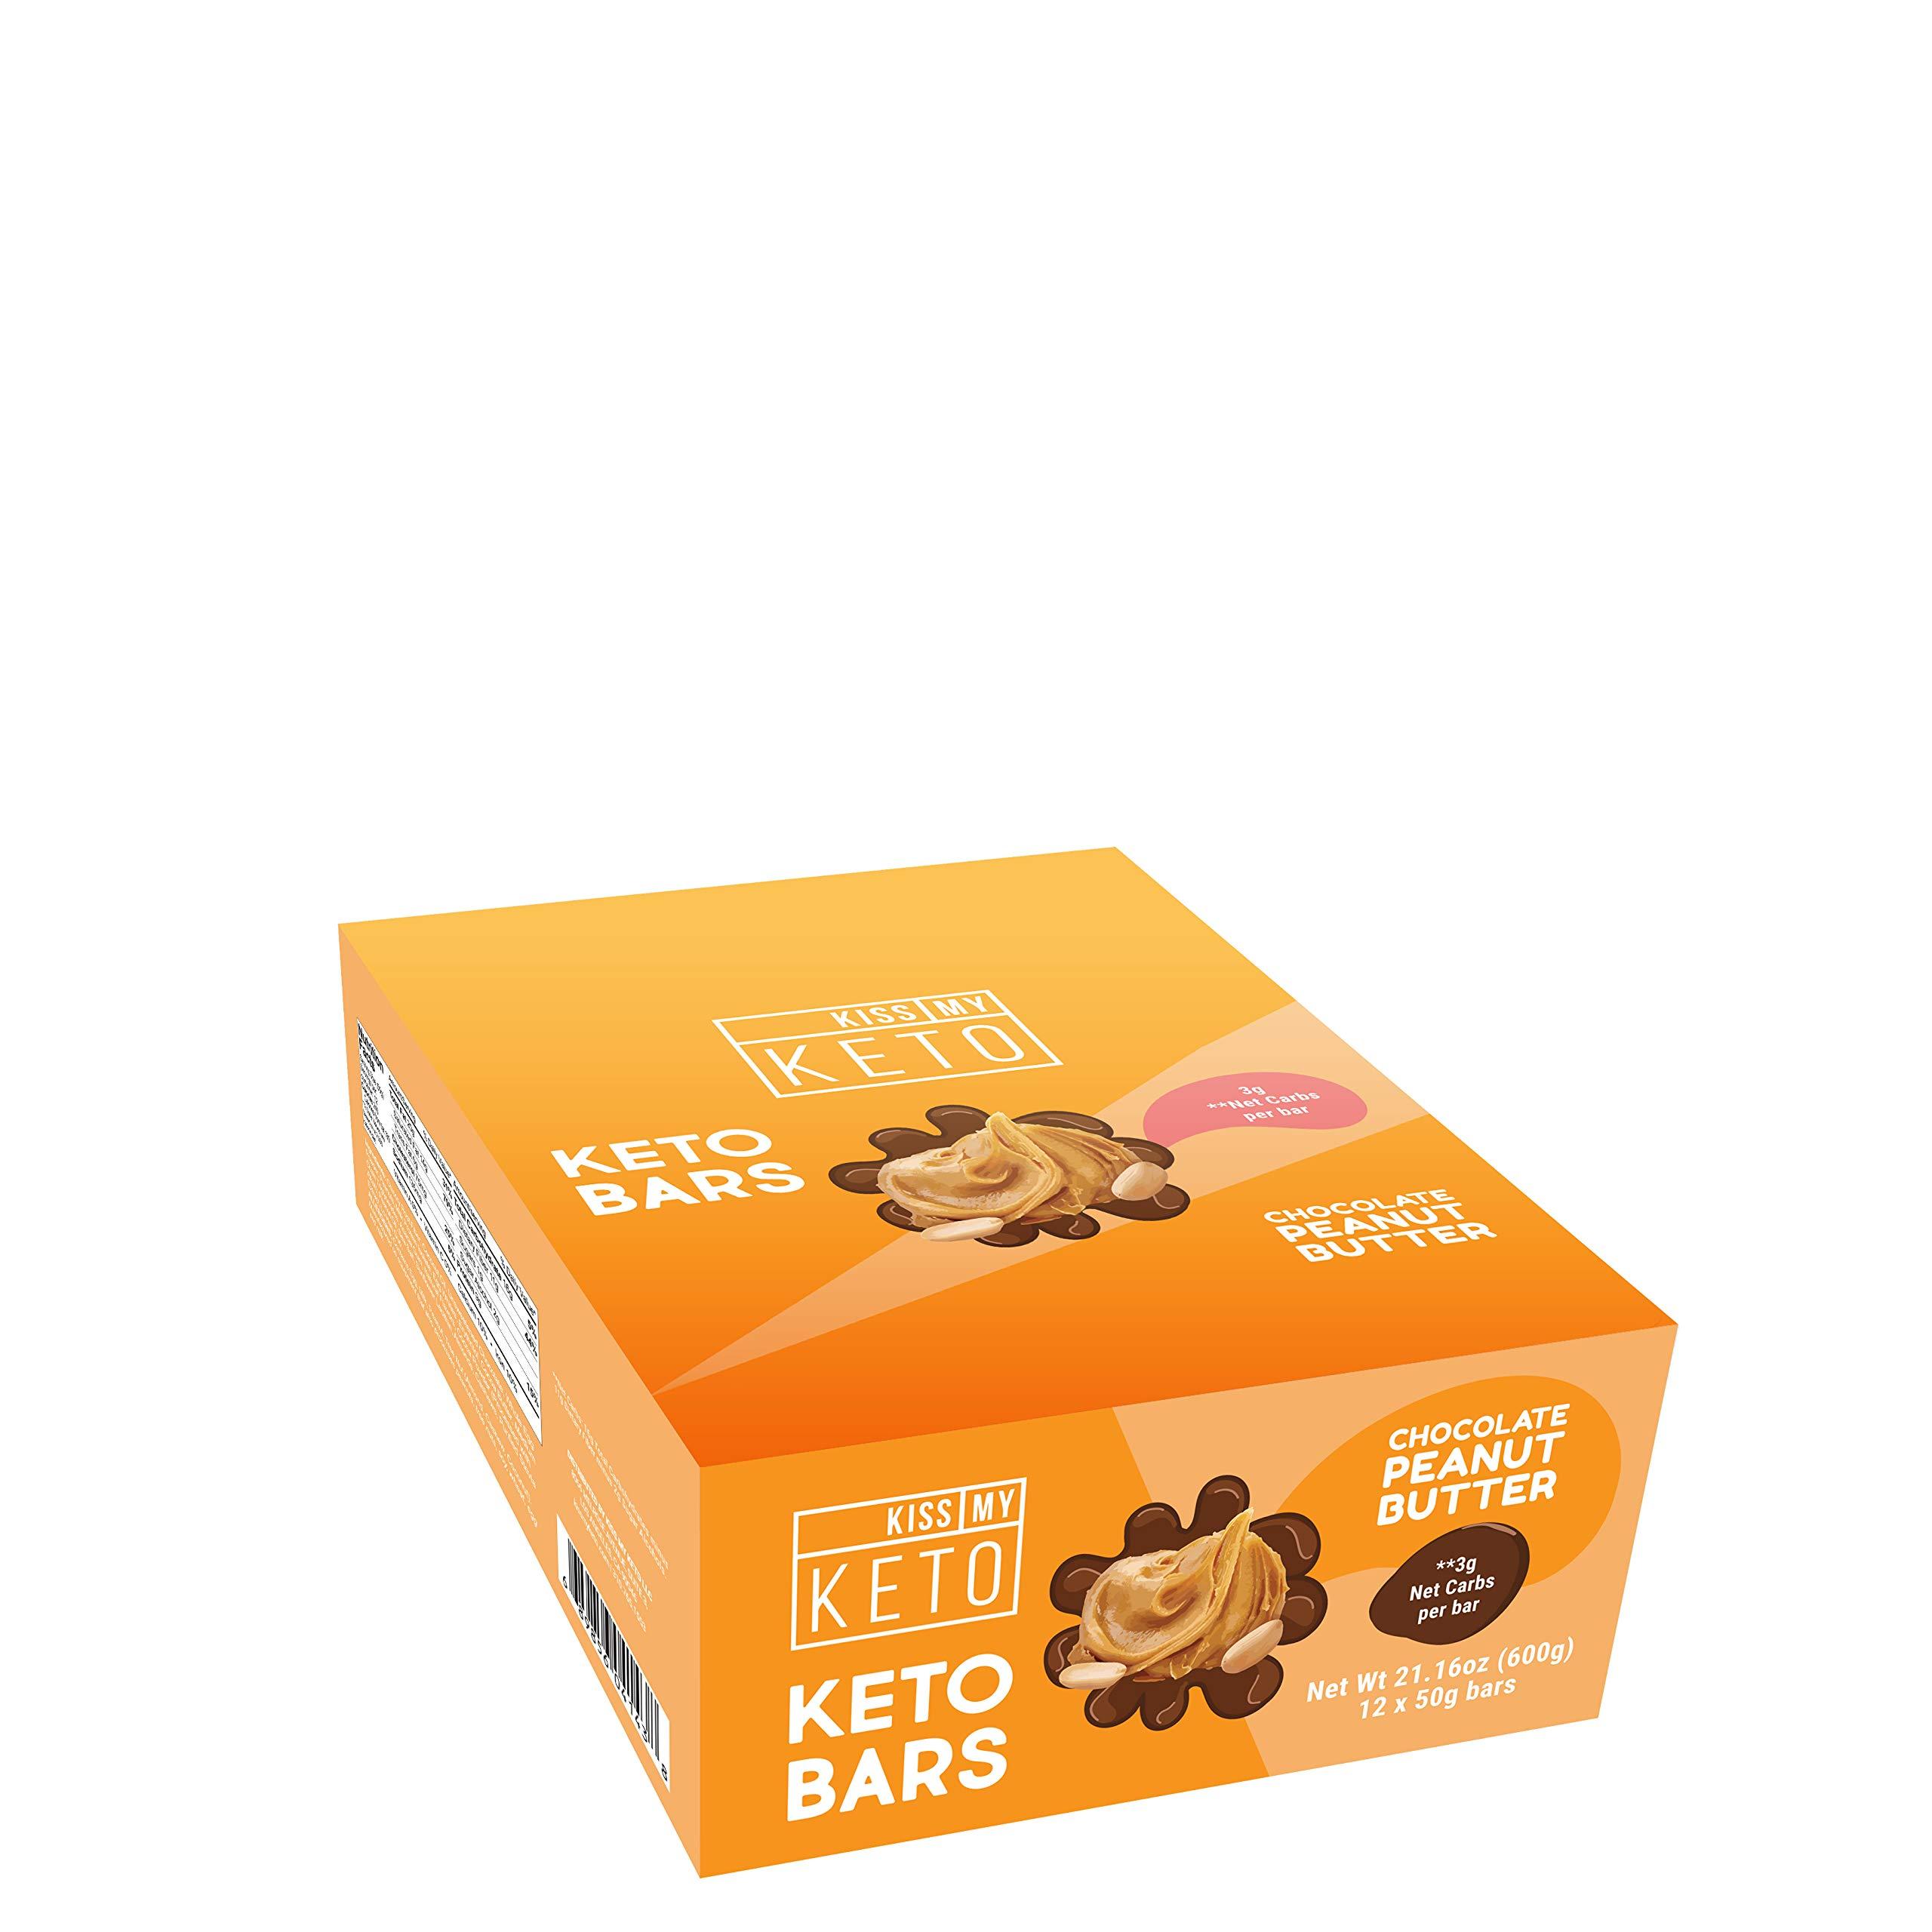 Kiss My Keto Snacks Keto Bars - Keto Chocolate Peanut Butter (3 Pack, 36 Bars), Nutritional Keto Food Bars, Paleo, Low Carb/Glycemic Keto Friendly Foods, All Natural On-The-Go Snacks, 3g Net by Kiss My Keto (Image #3)